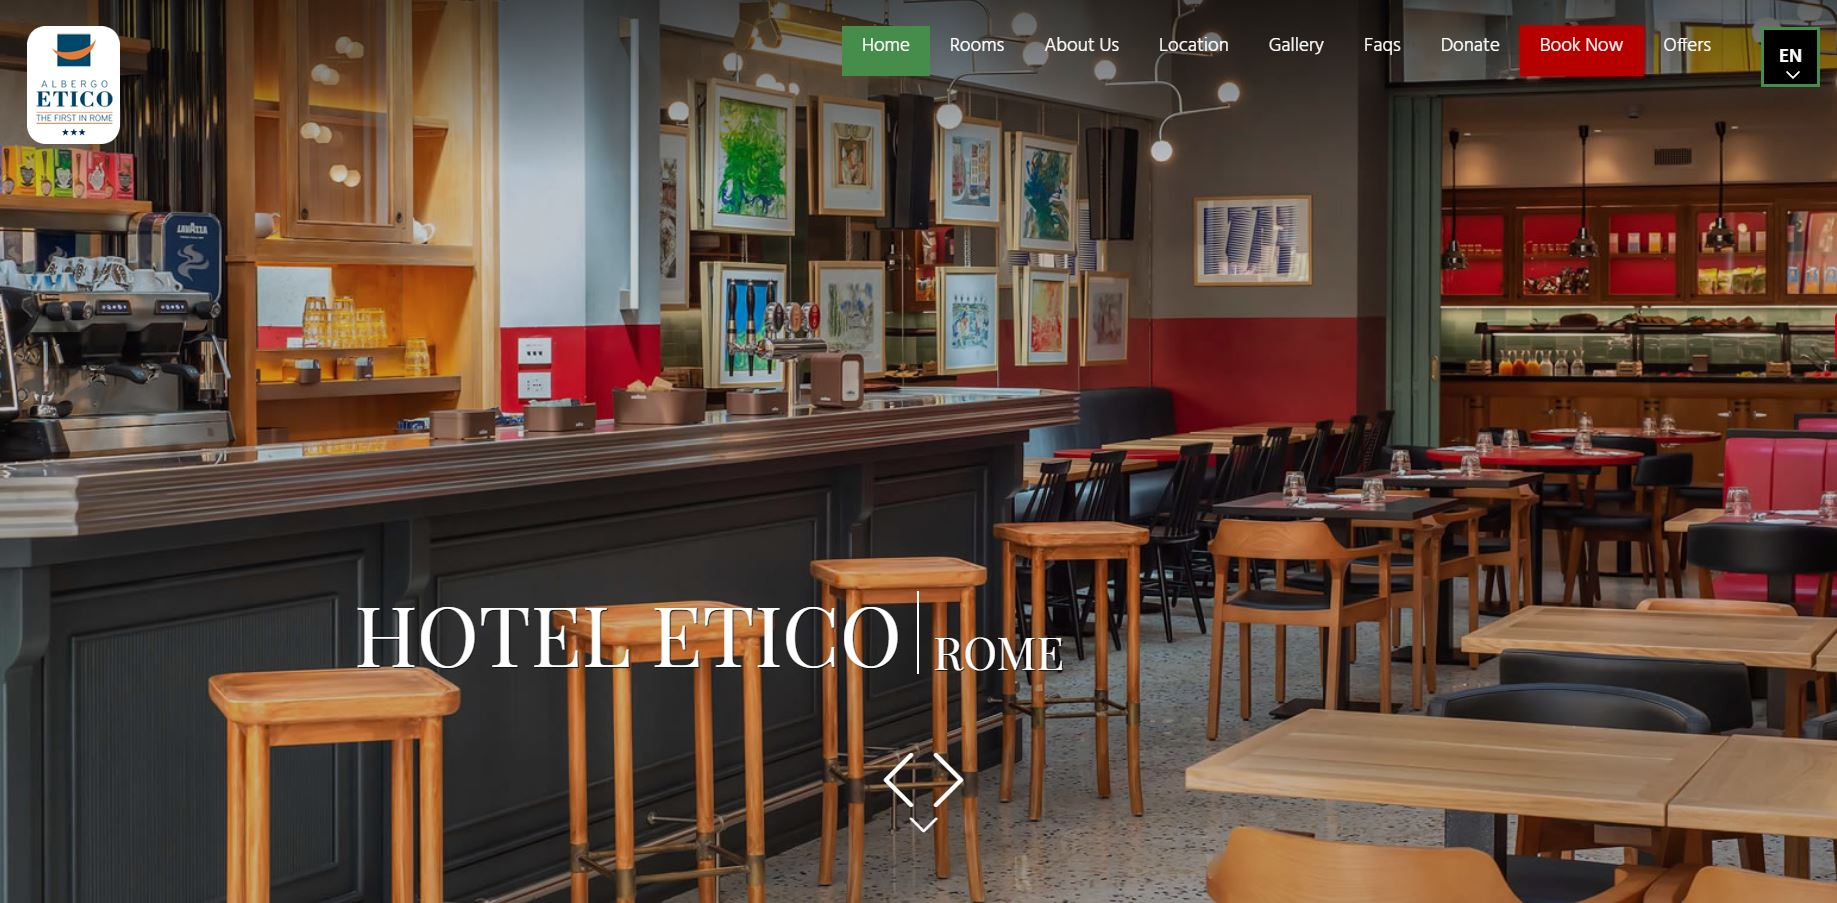 Hotel Etico - HotelVia Giuseppe Pisanelli, 39 - Roma